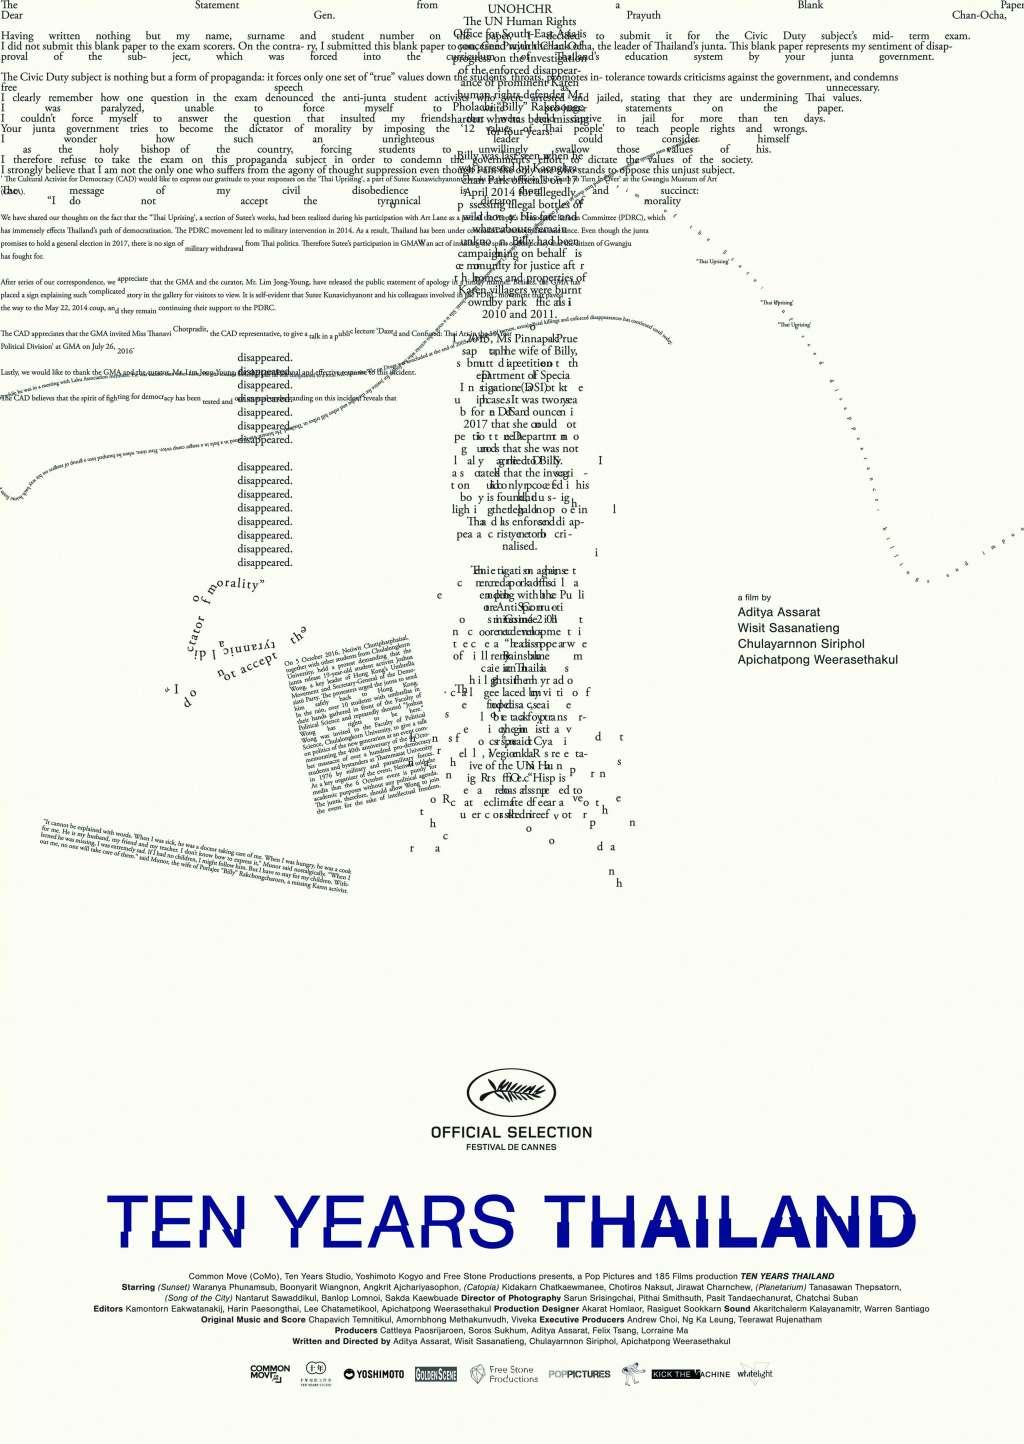 Ten Years Thailand kapak